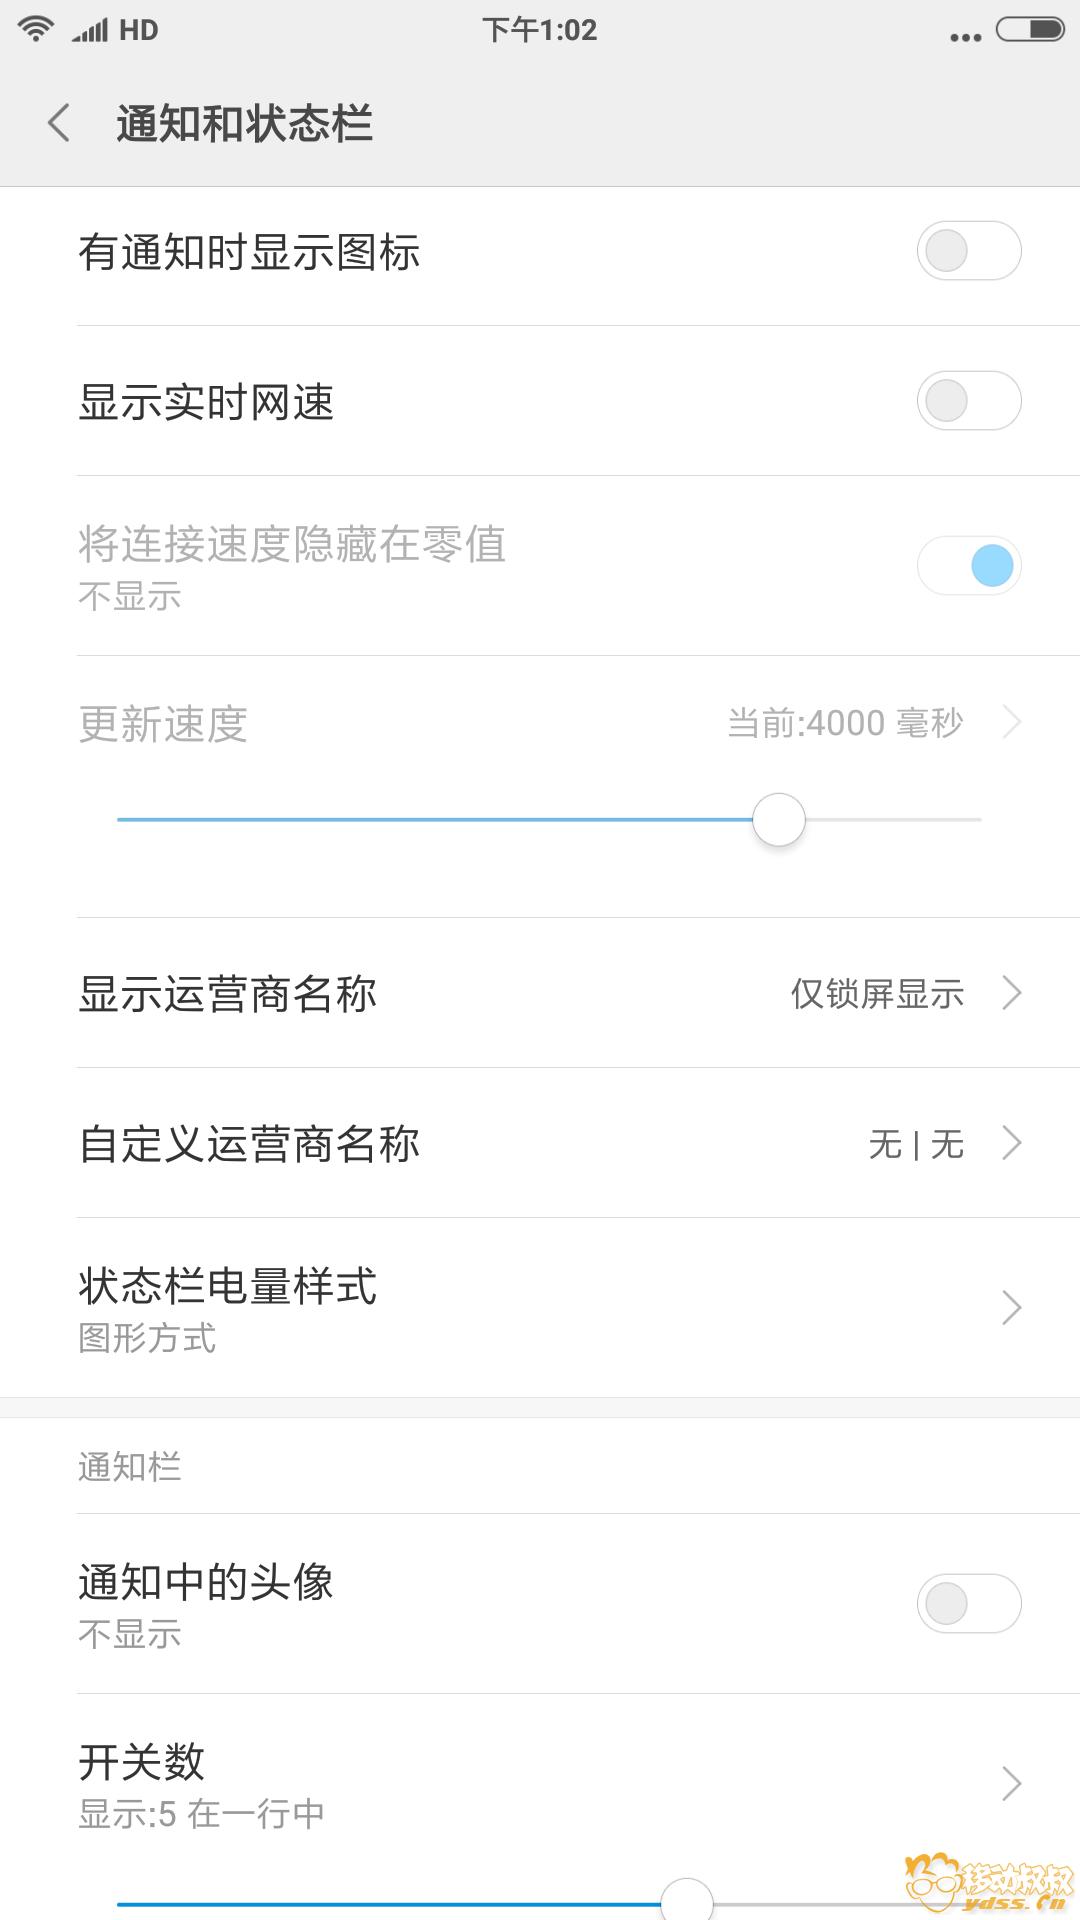 Screenshot_2018-04-04-13-02-08-844_com.android.se.png